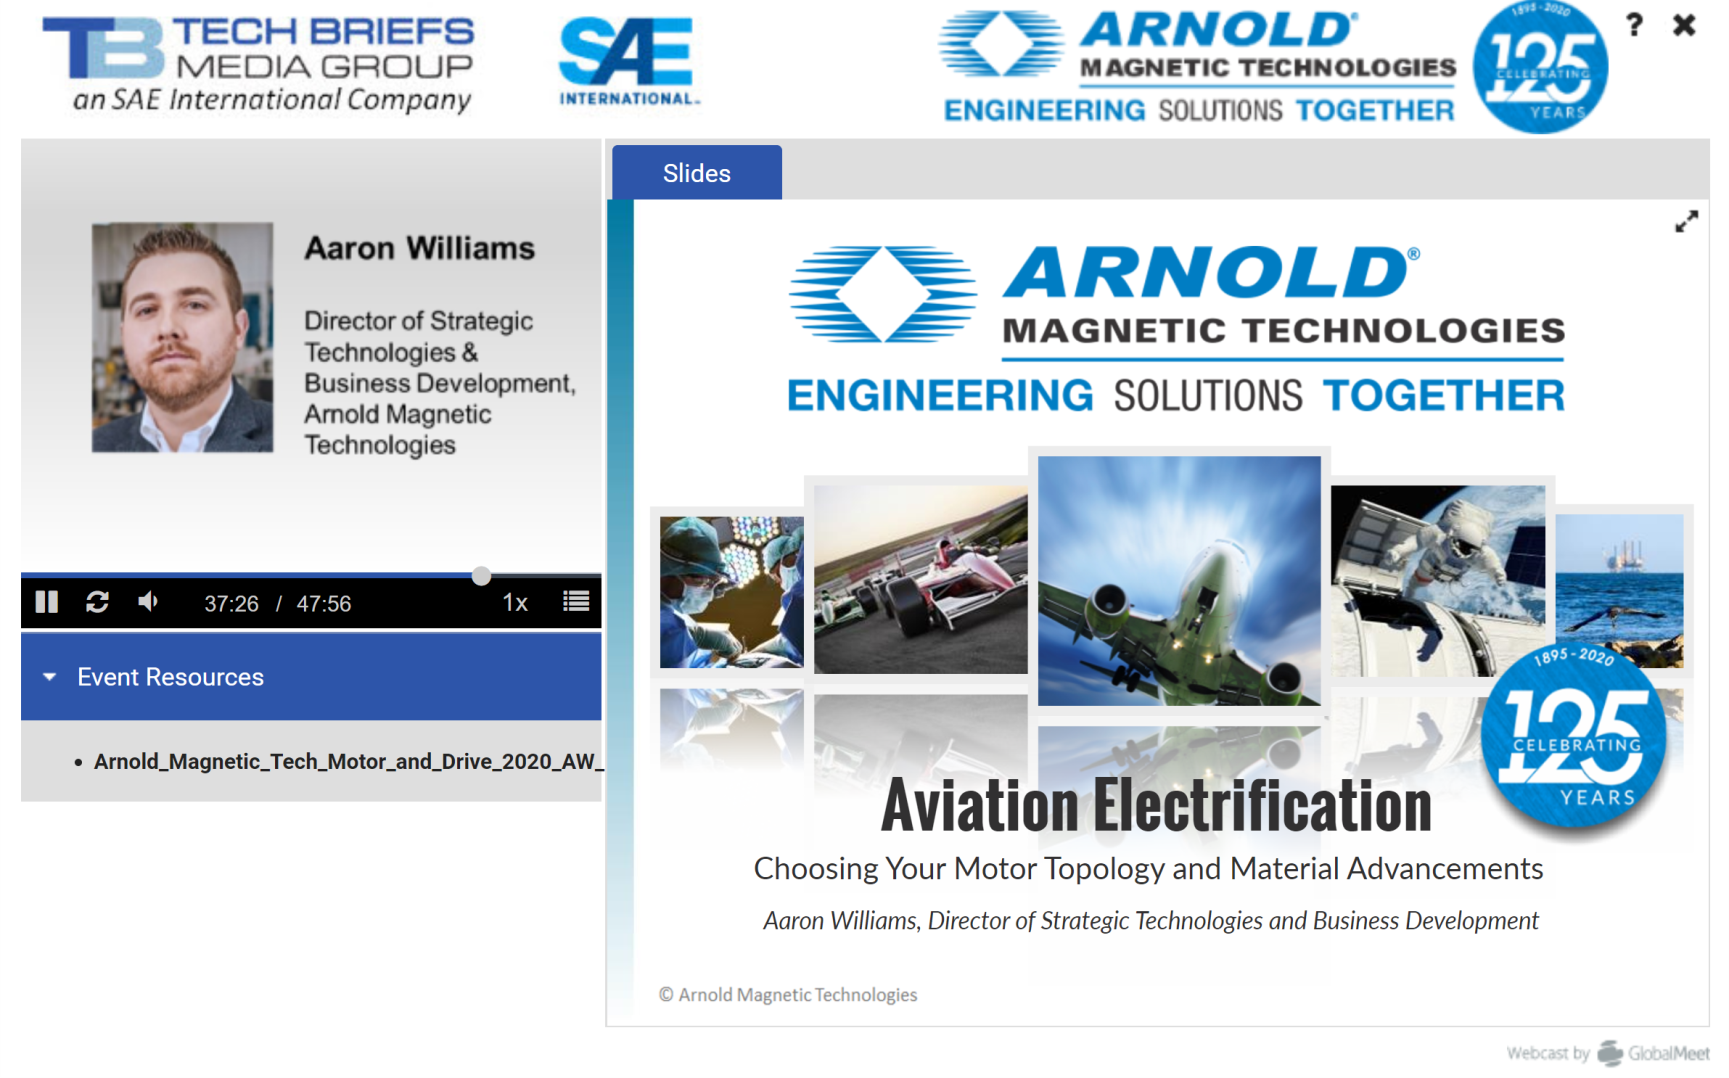 Arnold's First Webinar